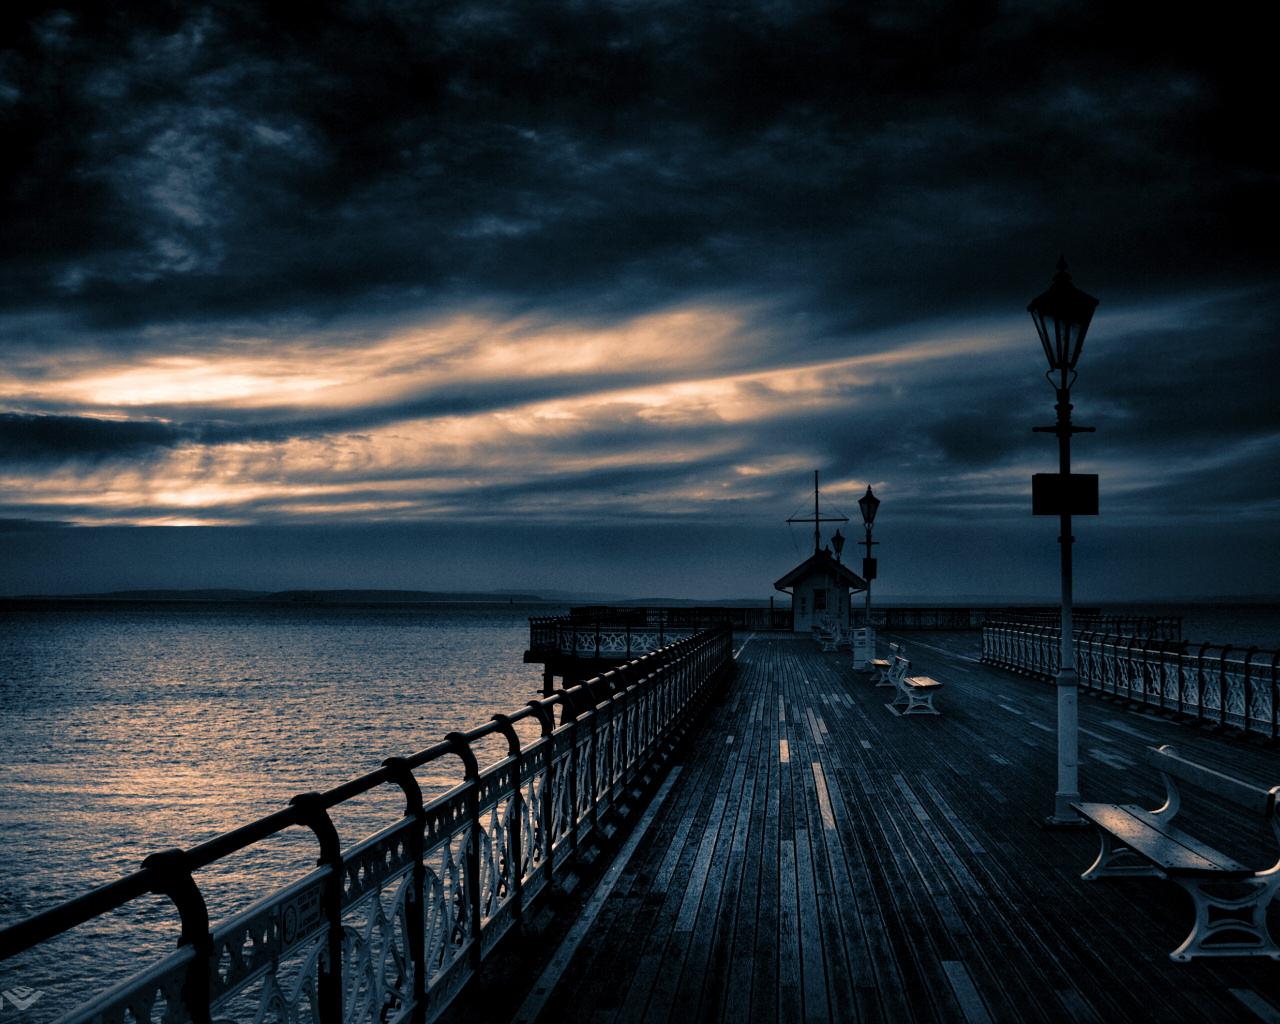 Free Download HQ Pier Storms Wallpaper Num. 5 : 1280 x 1024 618 Kb